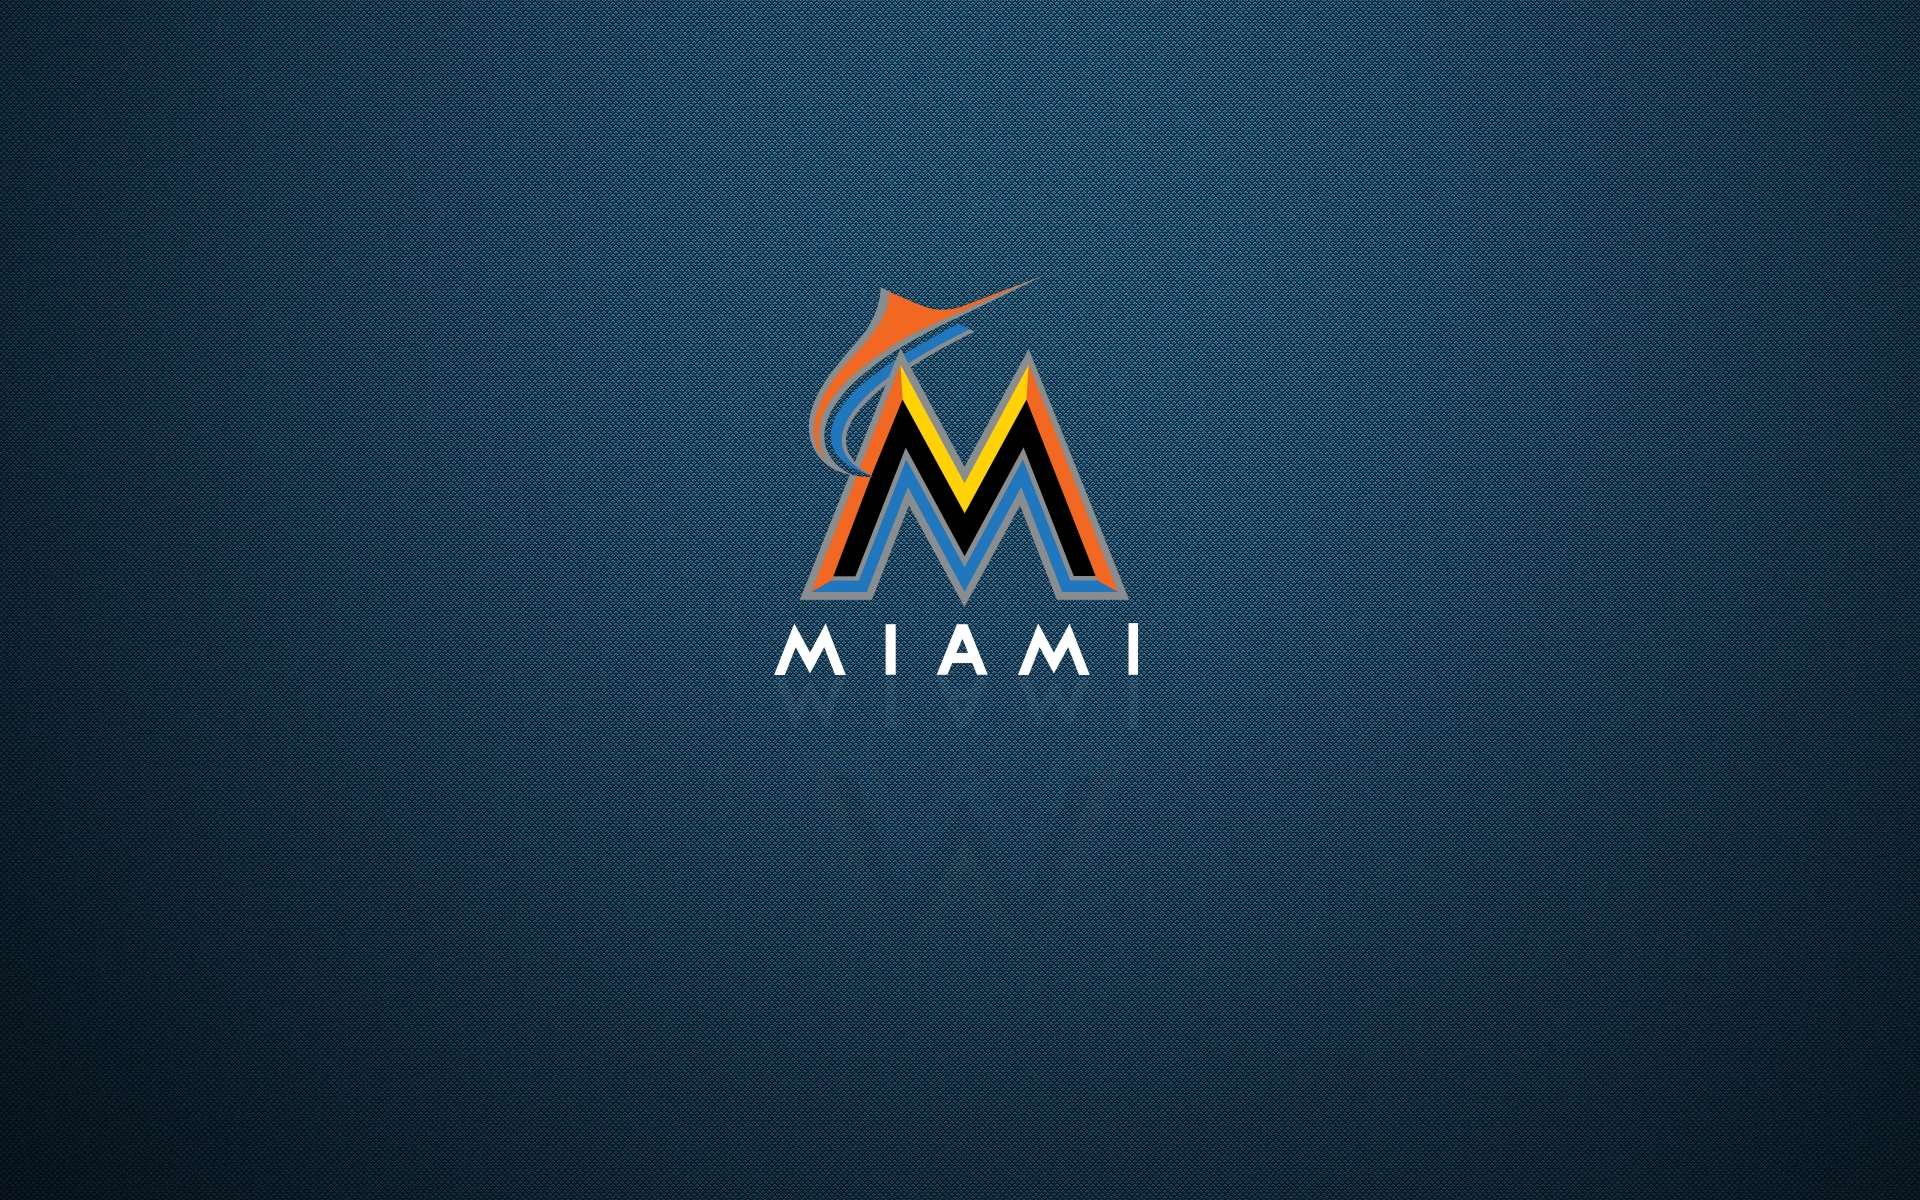 Dallas Stars Wallpaper Iphone Miami Marlins Logos Download